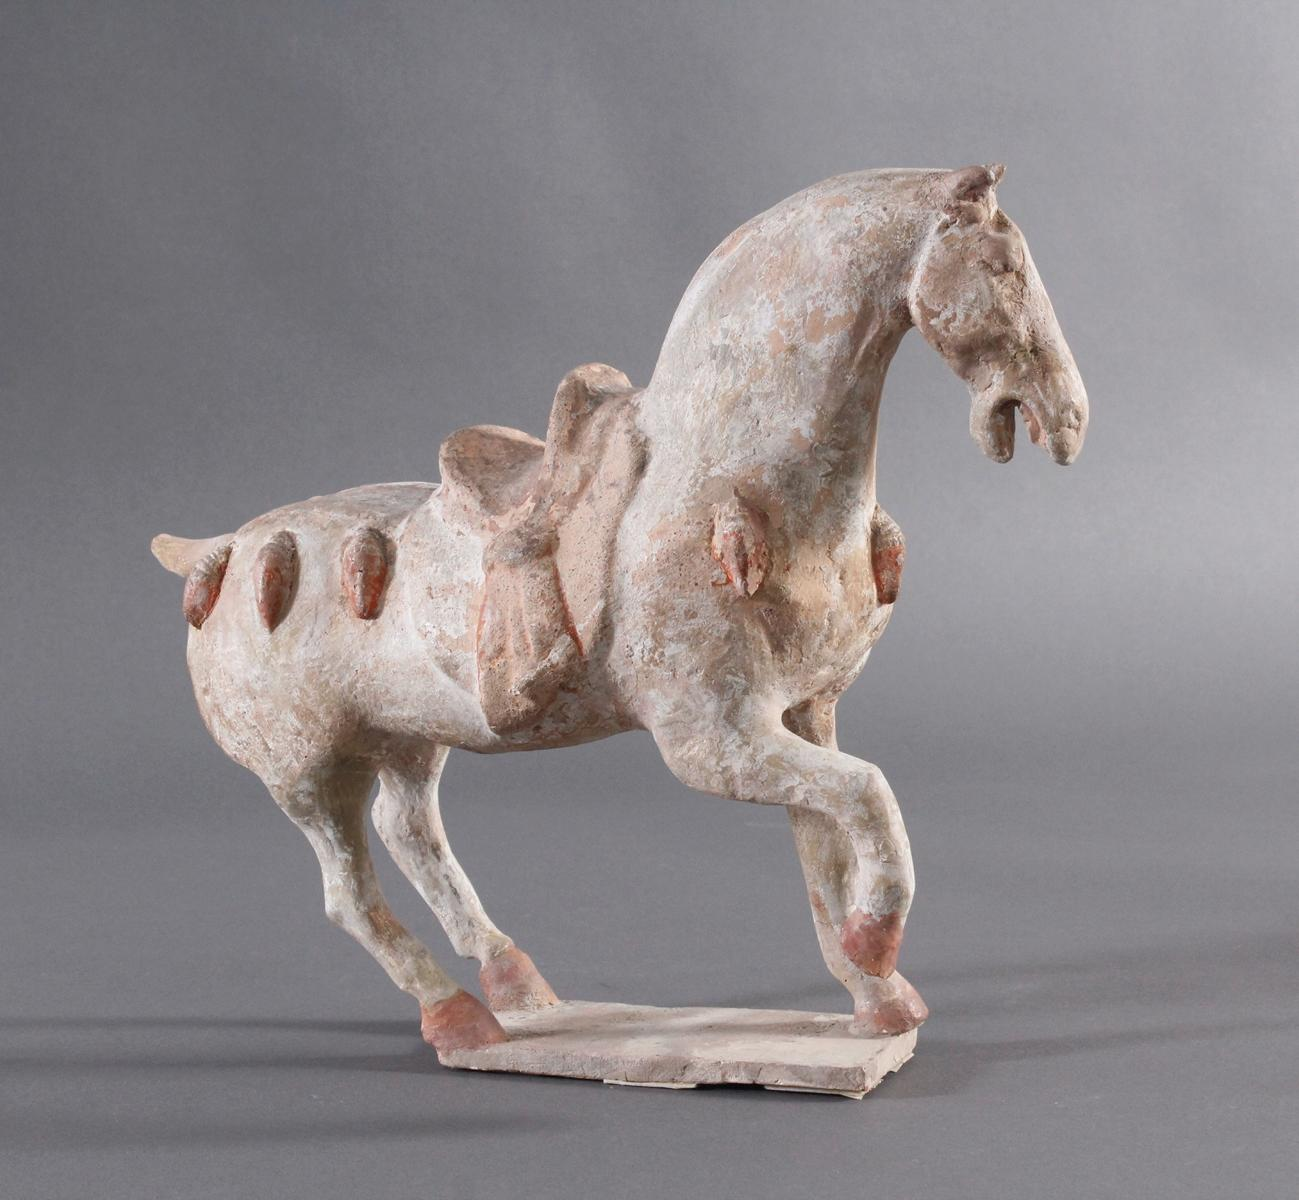 China Tang-Dynastie, Pferd aus gebranntem Ton-2